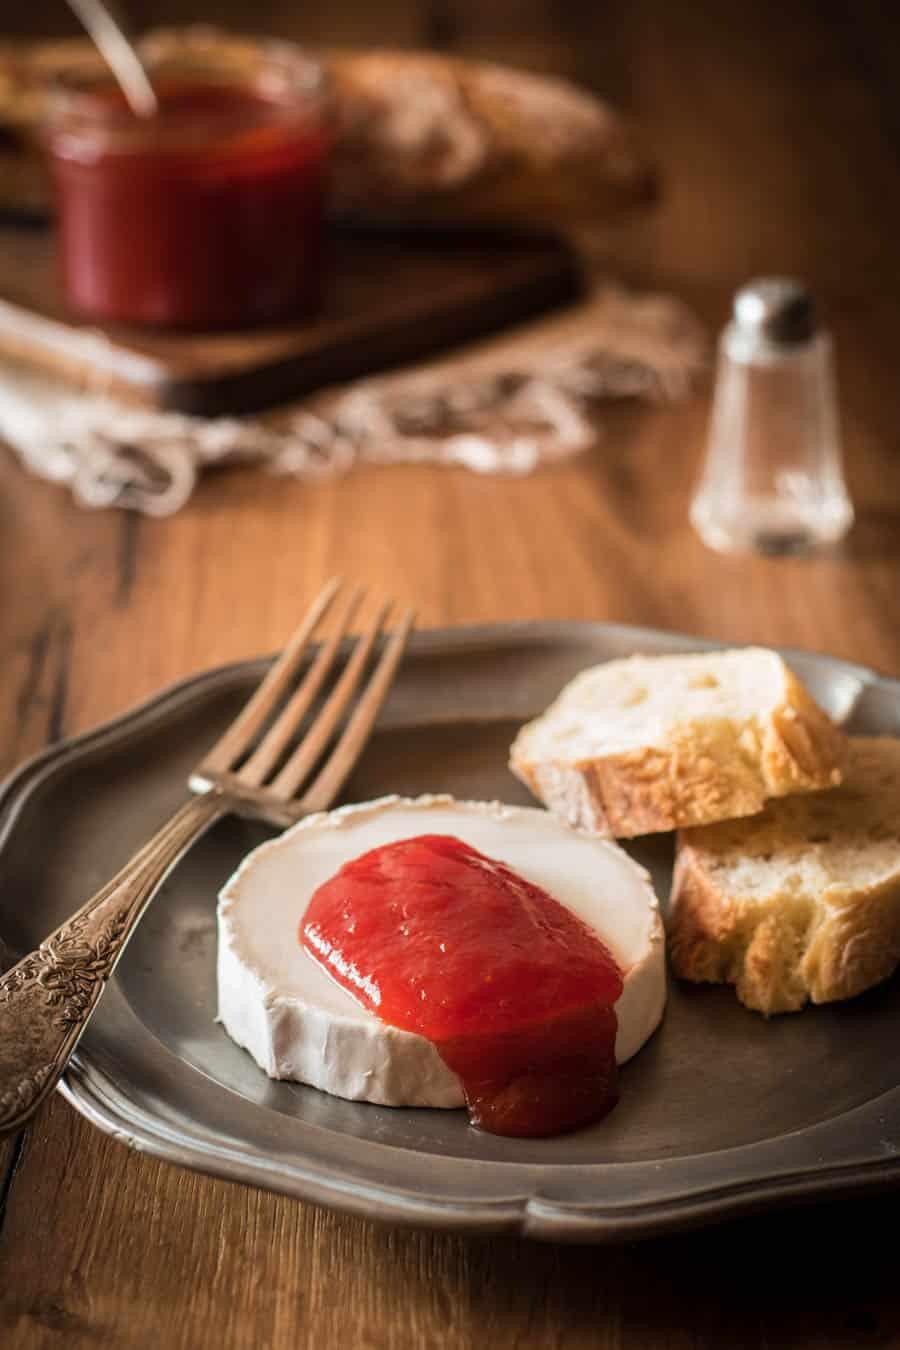 Paprikamarmelade Mermelada de pimientos rojos - Kleines Kulinarium